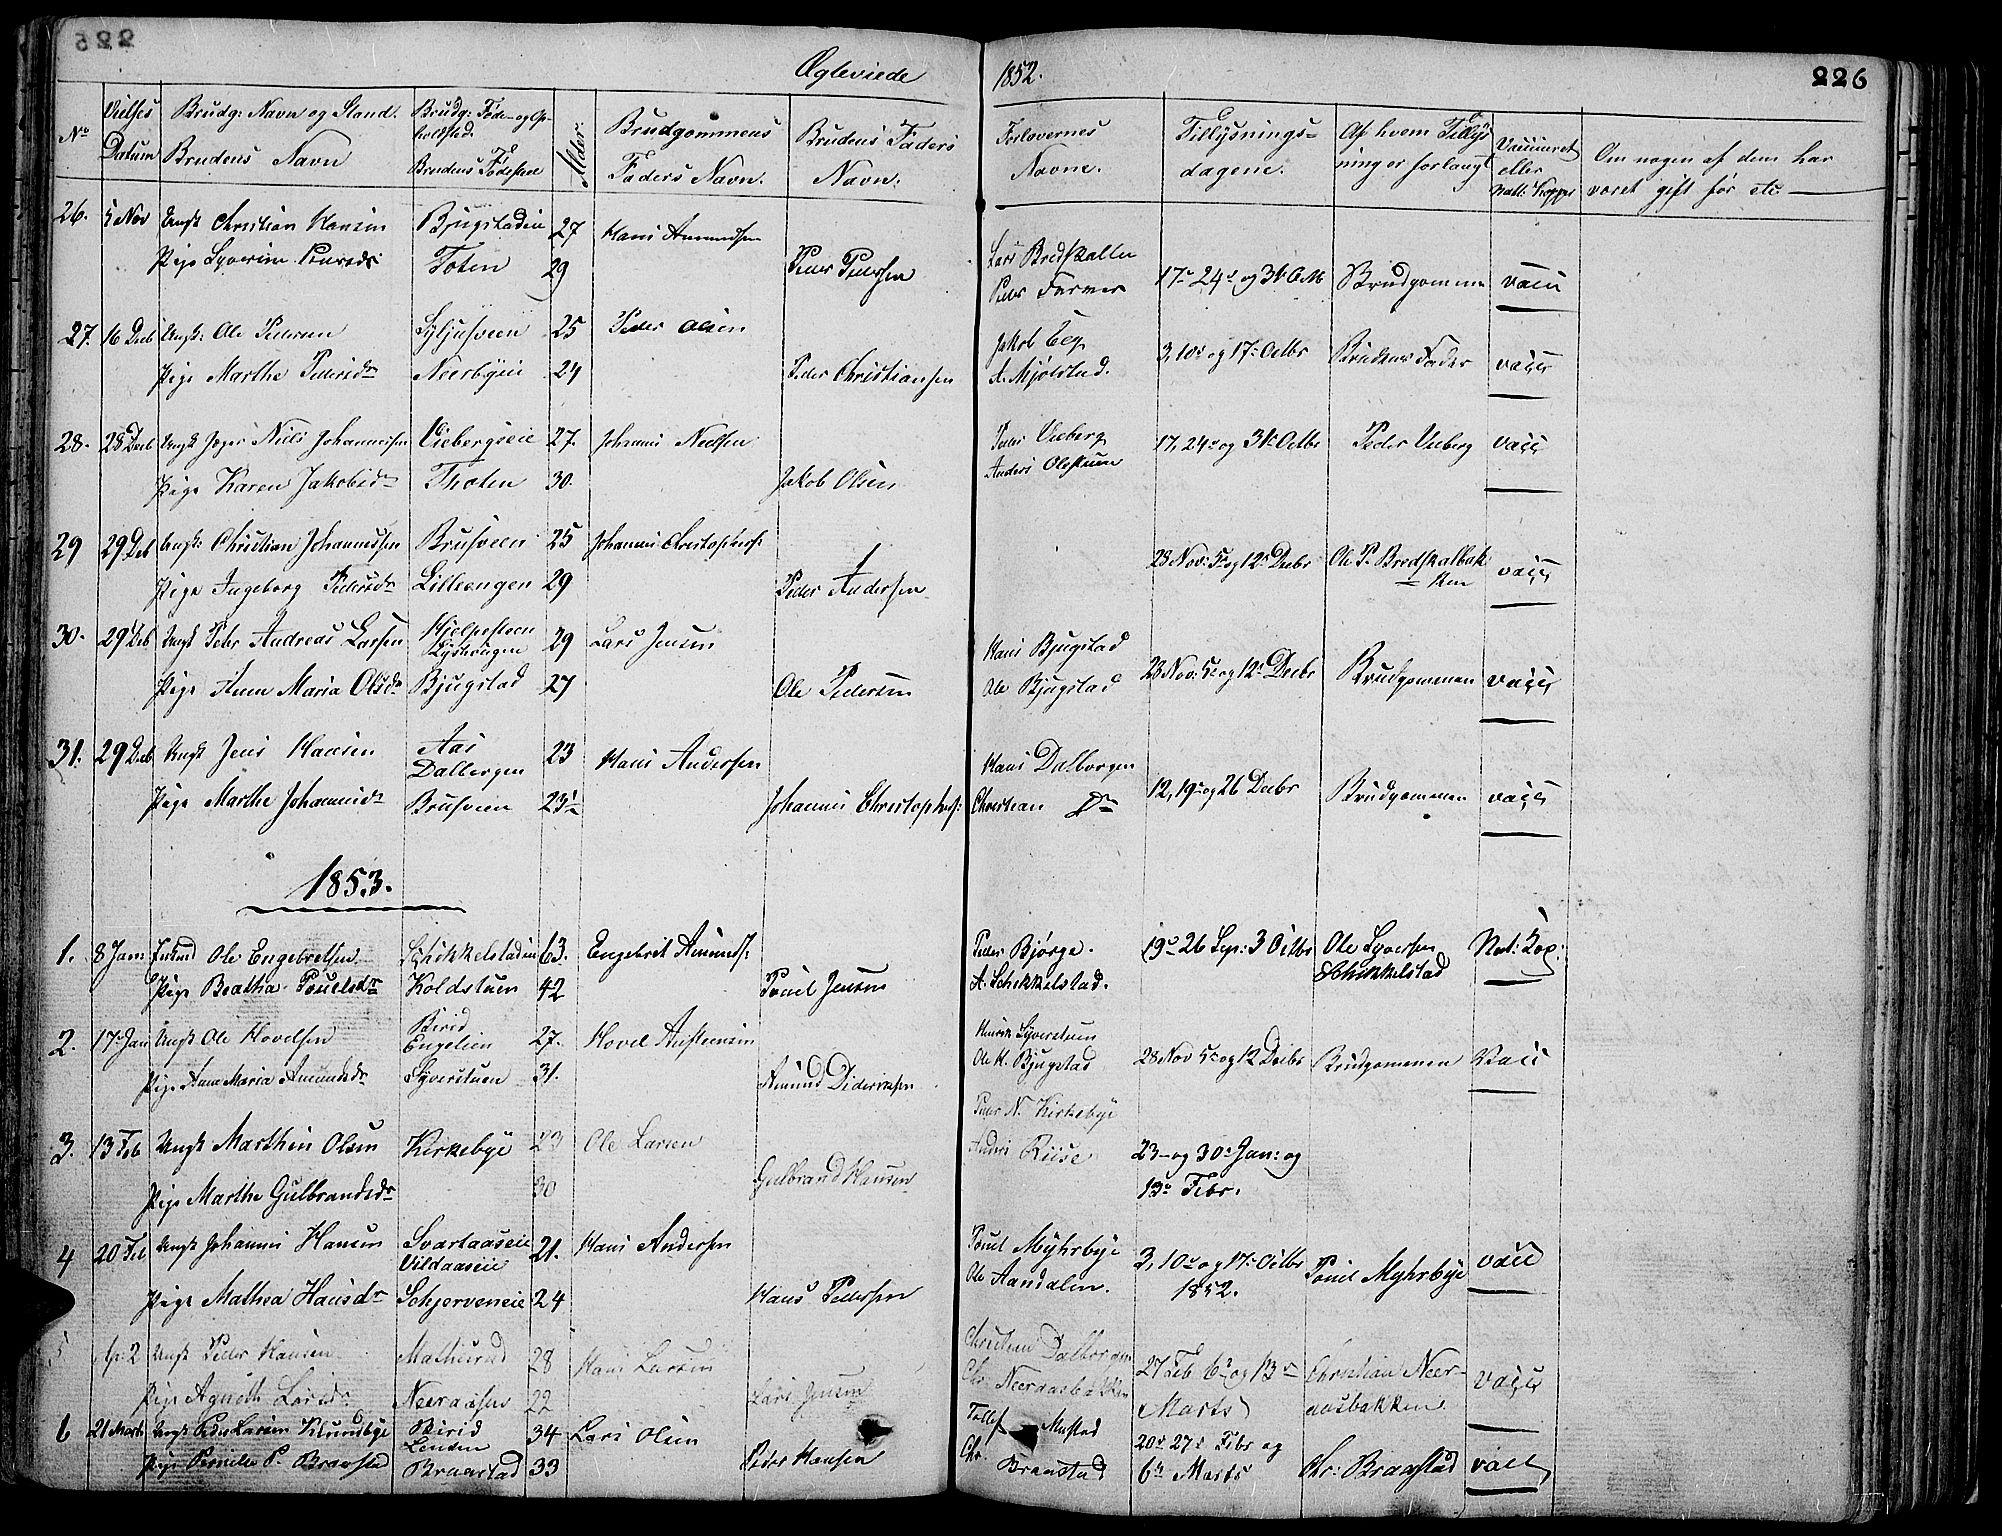 SAH, Vardal prestekontor, H/Ha/Hab/L0004: Klokkerbok nr. 4, 1831-1853, s. 226